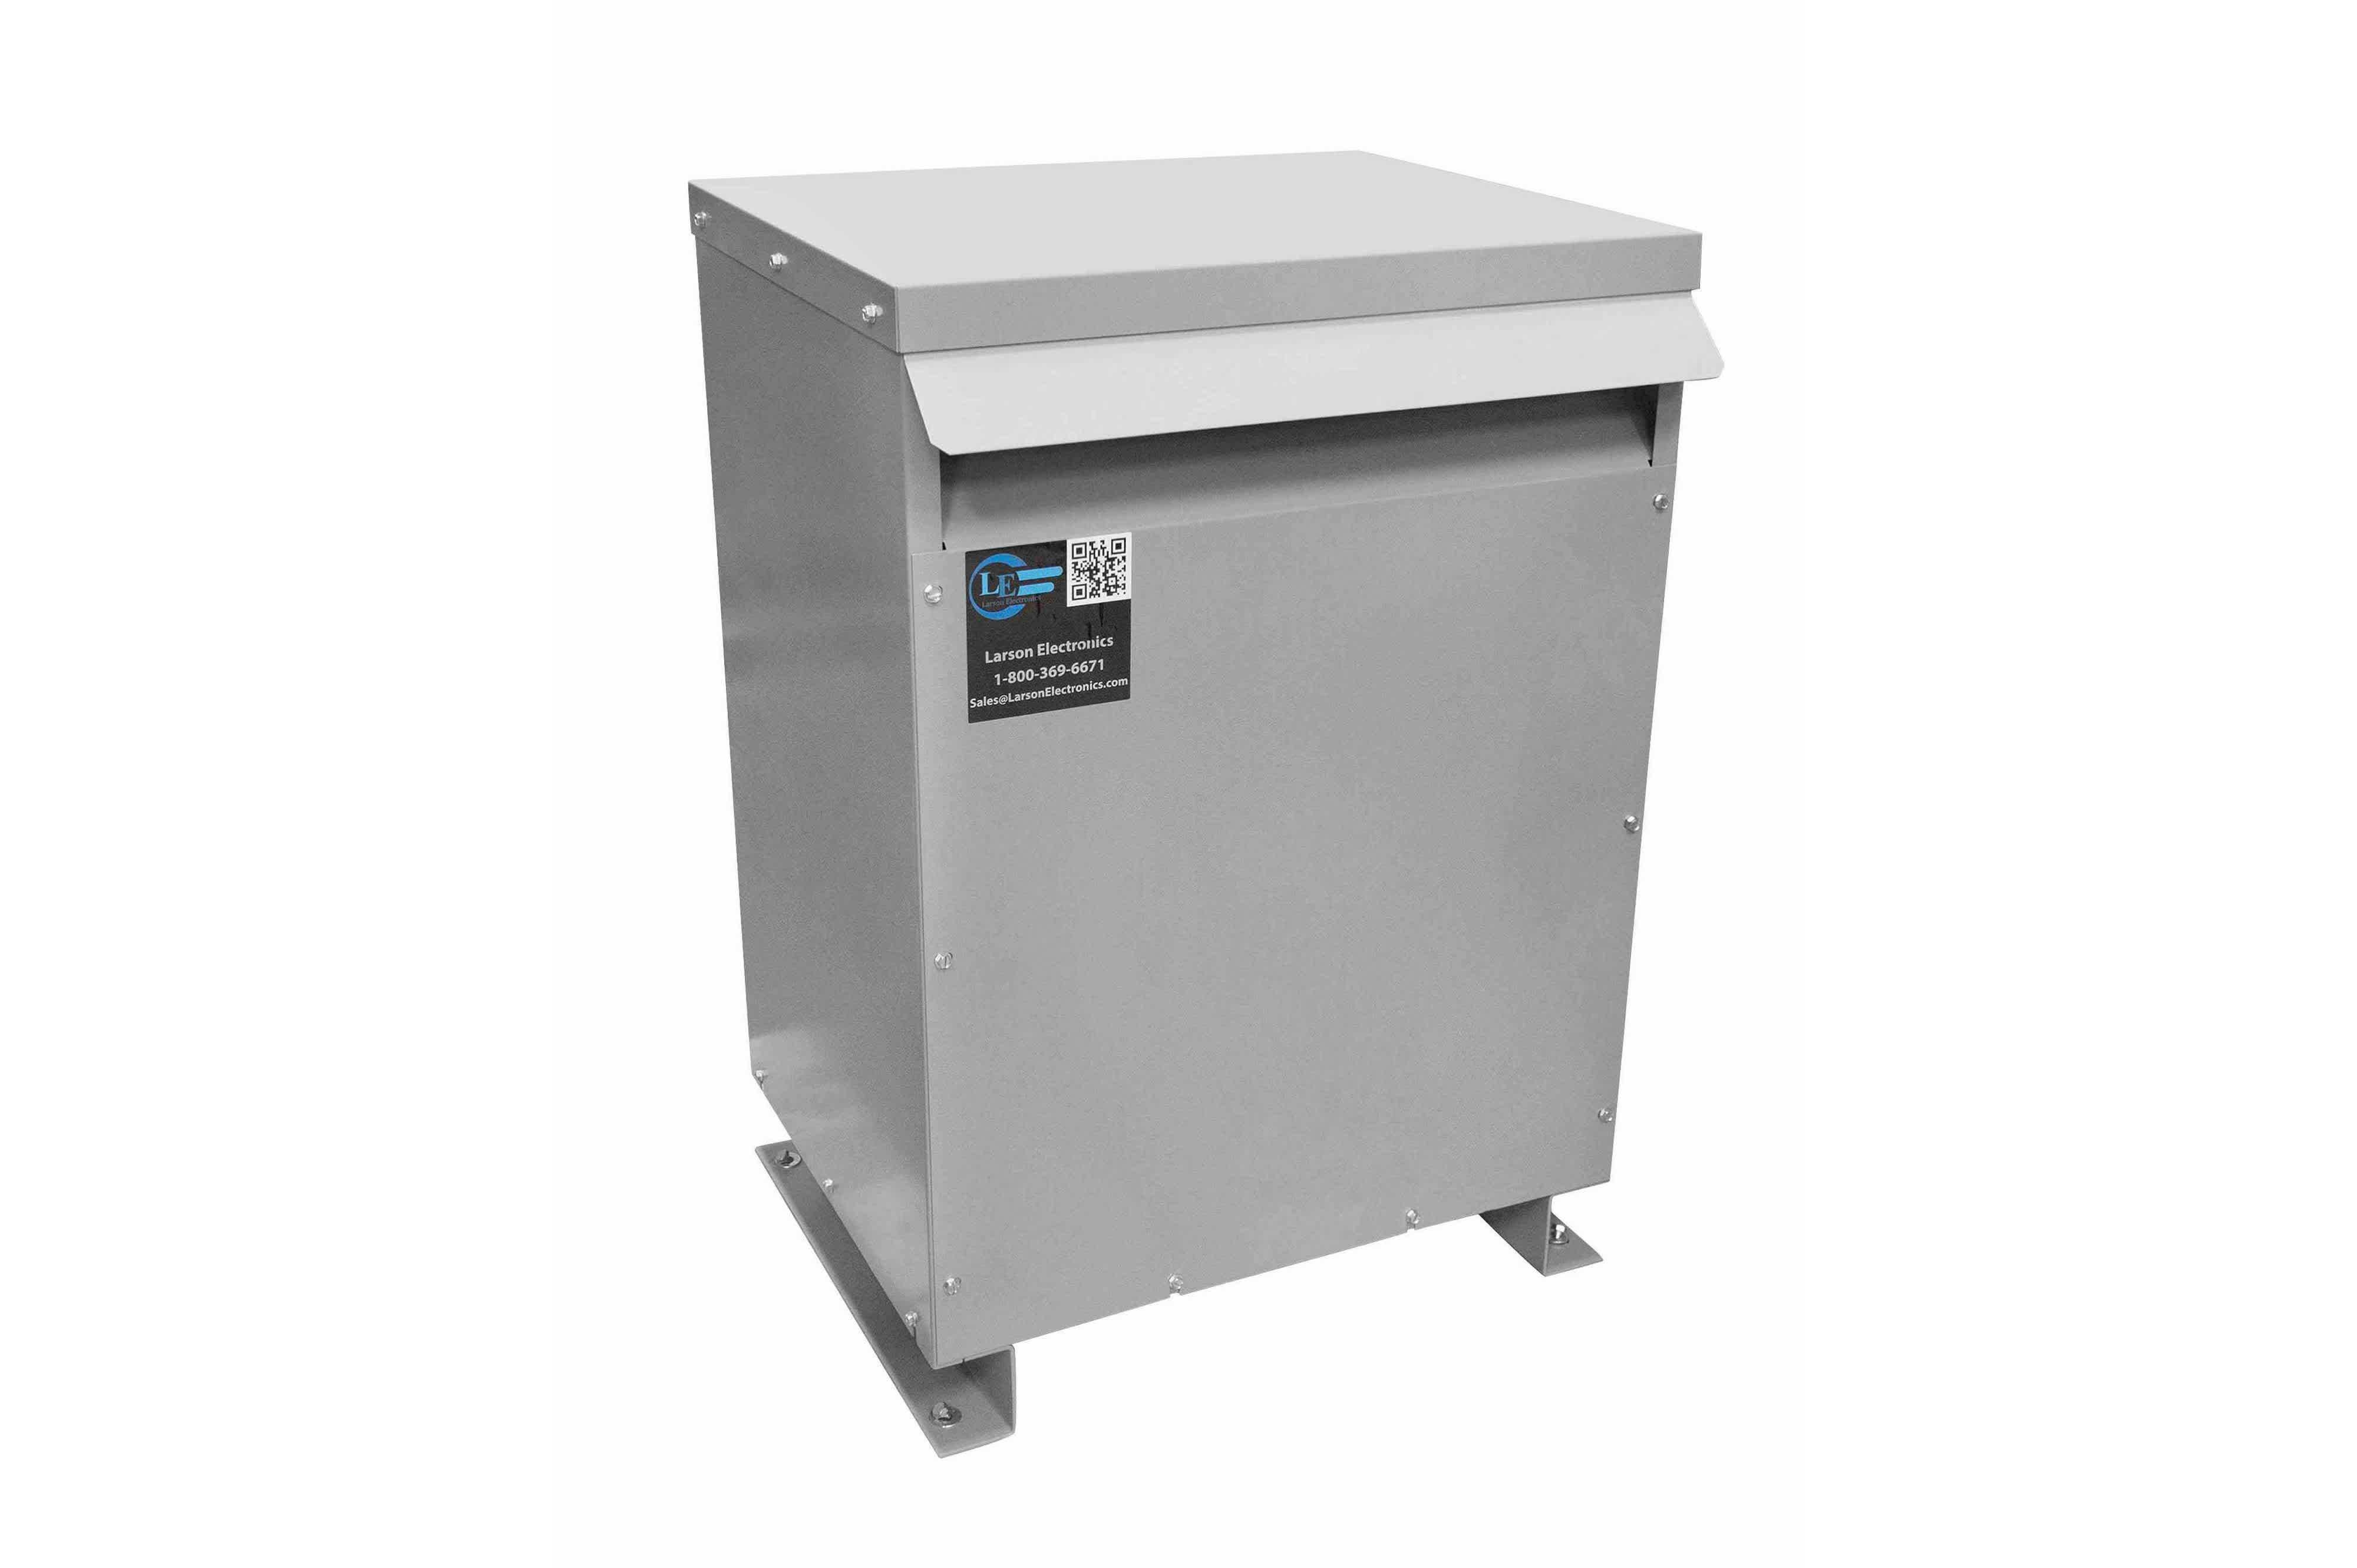 80 kVA 3PH DOE Transformer, 460V Delta Primary, 400Y/231 Wye-N Secondary, N3R, Ventilated, 60 Hz